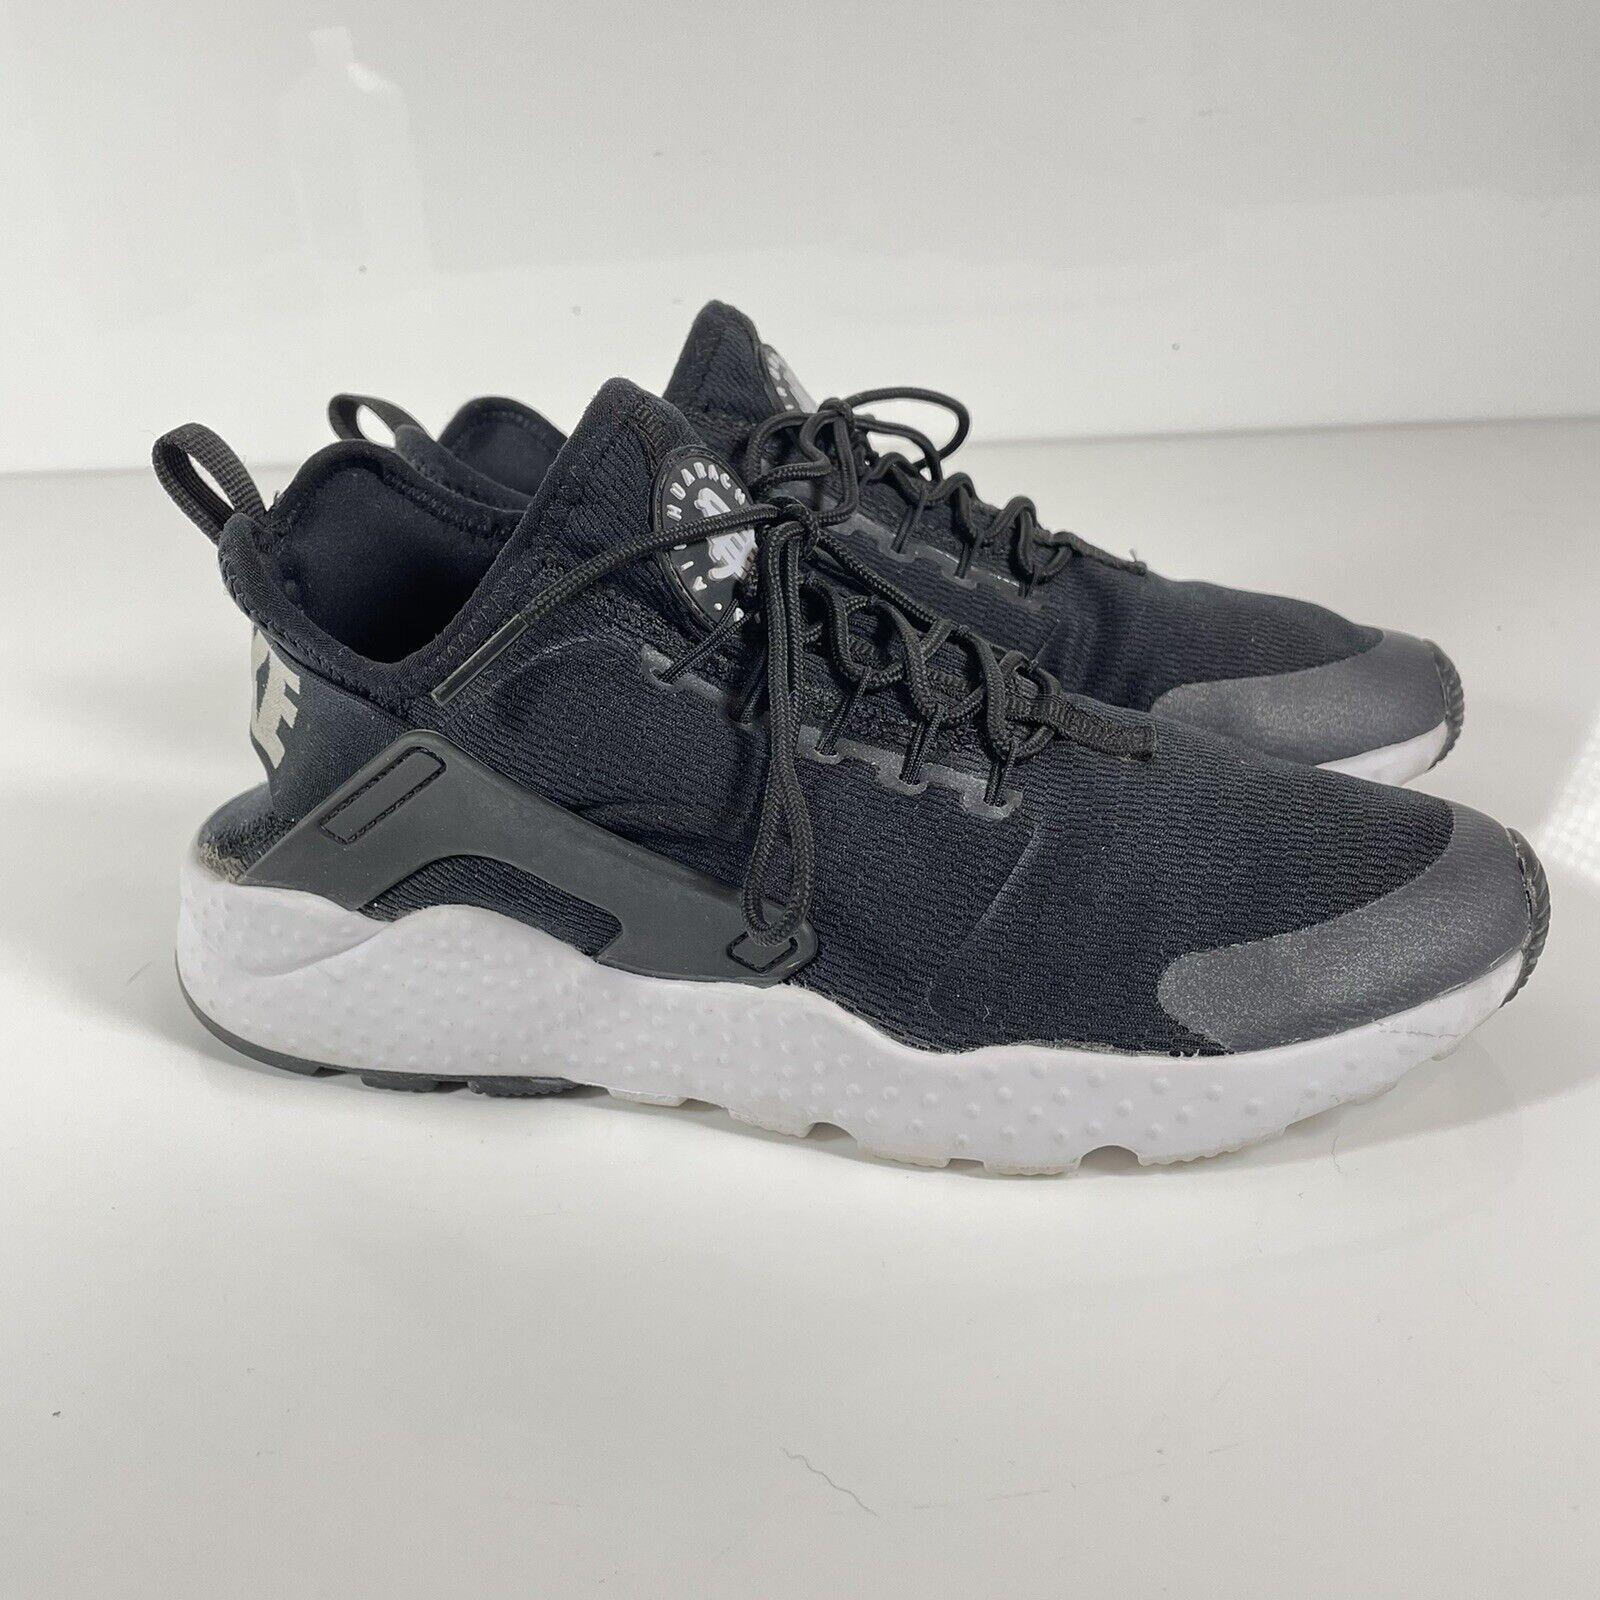 Adelante sarcoma toxicidad  Nike Air Huarache Ultra Women Trainers in Black & White 819151 001 UK 5.5  EU 39 for sale online | eBay